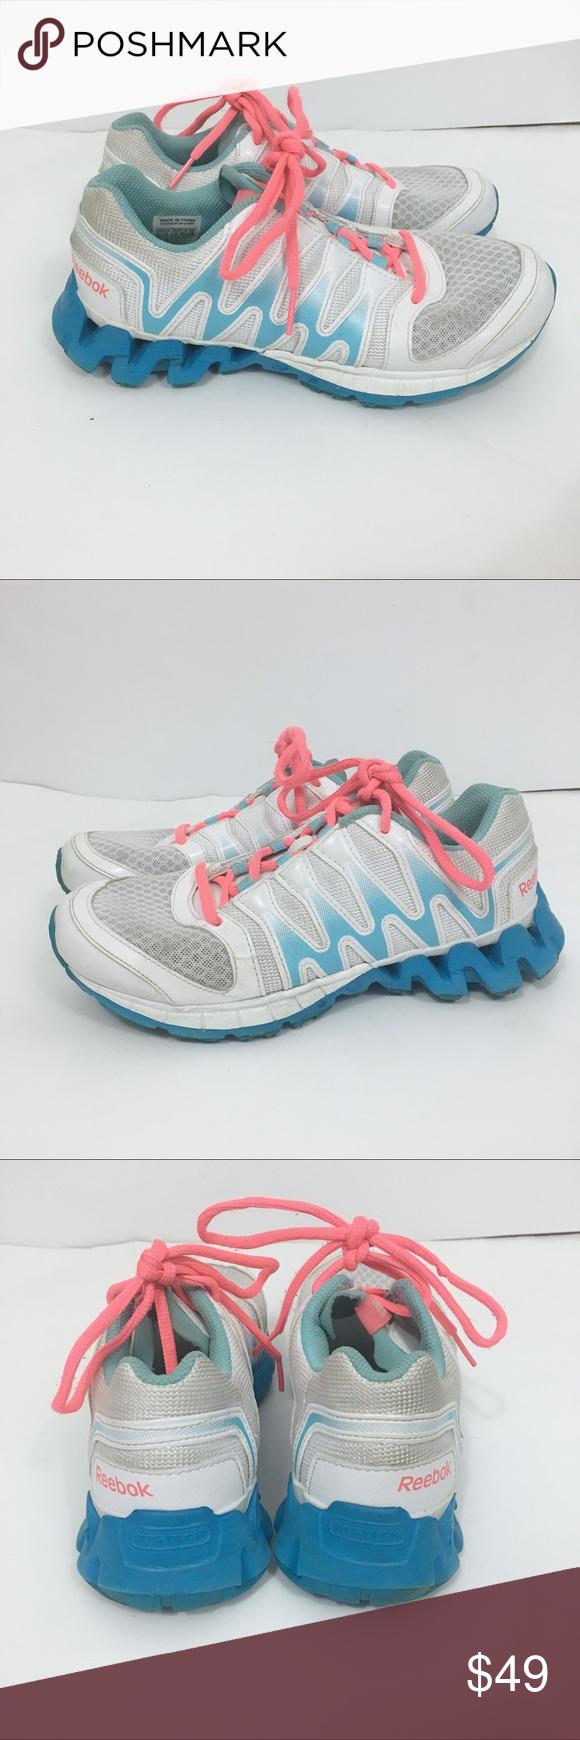 a4fb2e96f3978 Reebok zigtech shoes size 6.5 Size 6.5 Light wear Reebok Shoes Athletic  Shoes